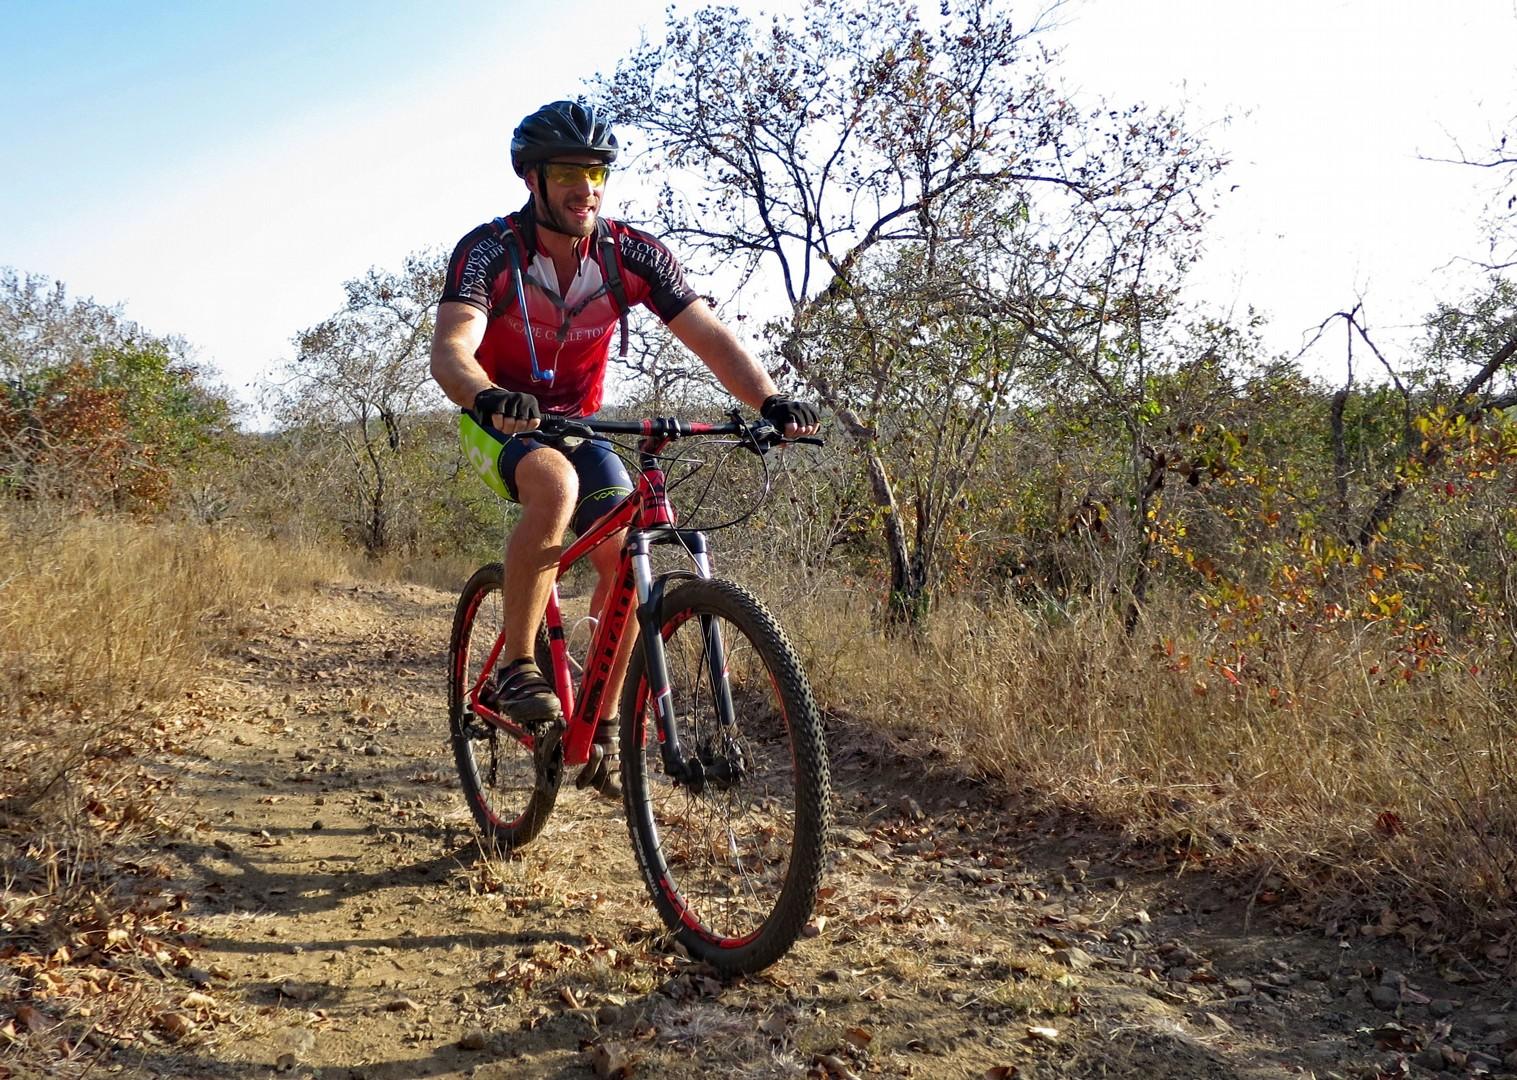 singletrack-swaziland-mountain-bike-holiday-in-africa.jpg - Swaziland - Singletrack and Sundowners - Guided Mountain Bike Holiday - Mountain Biking